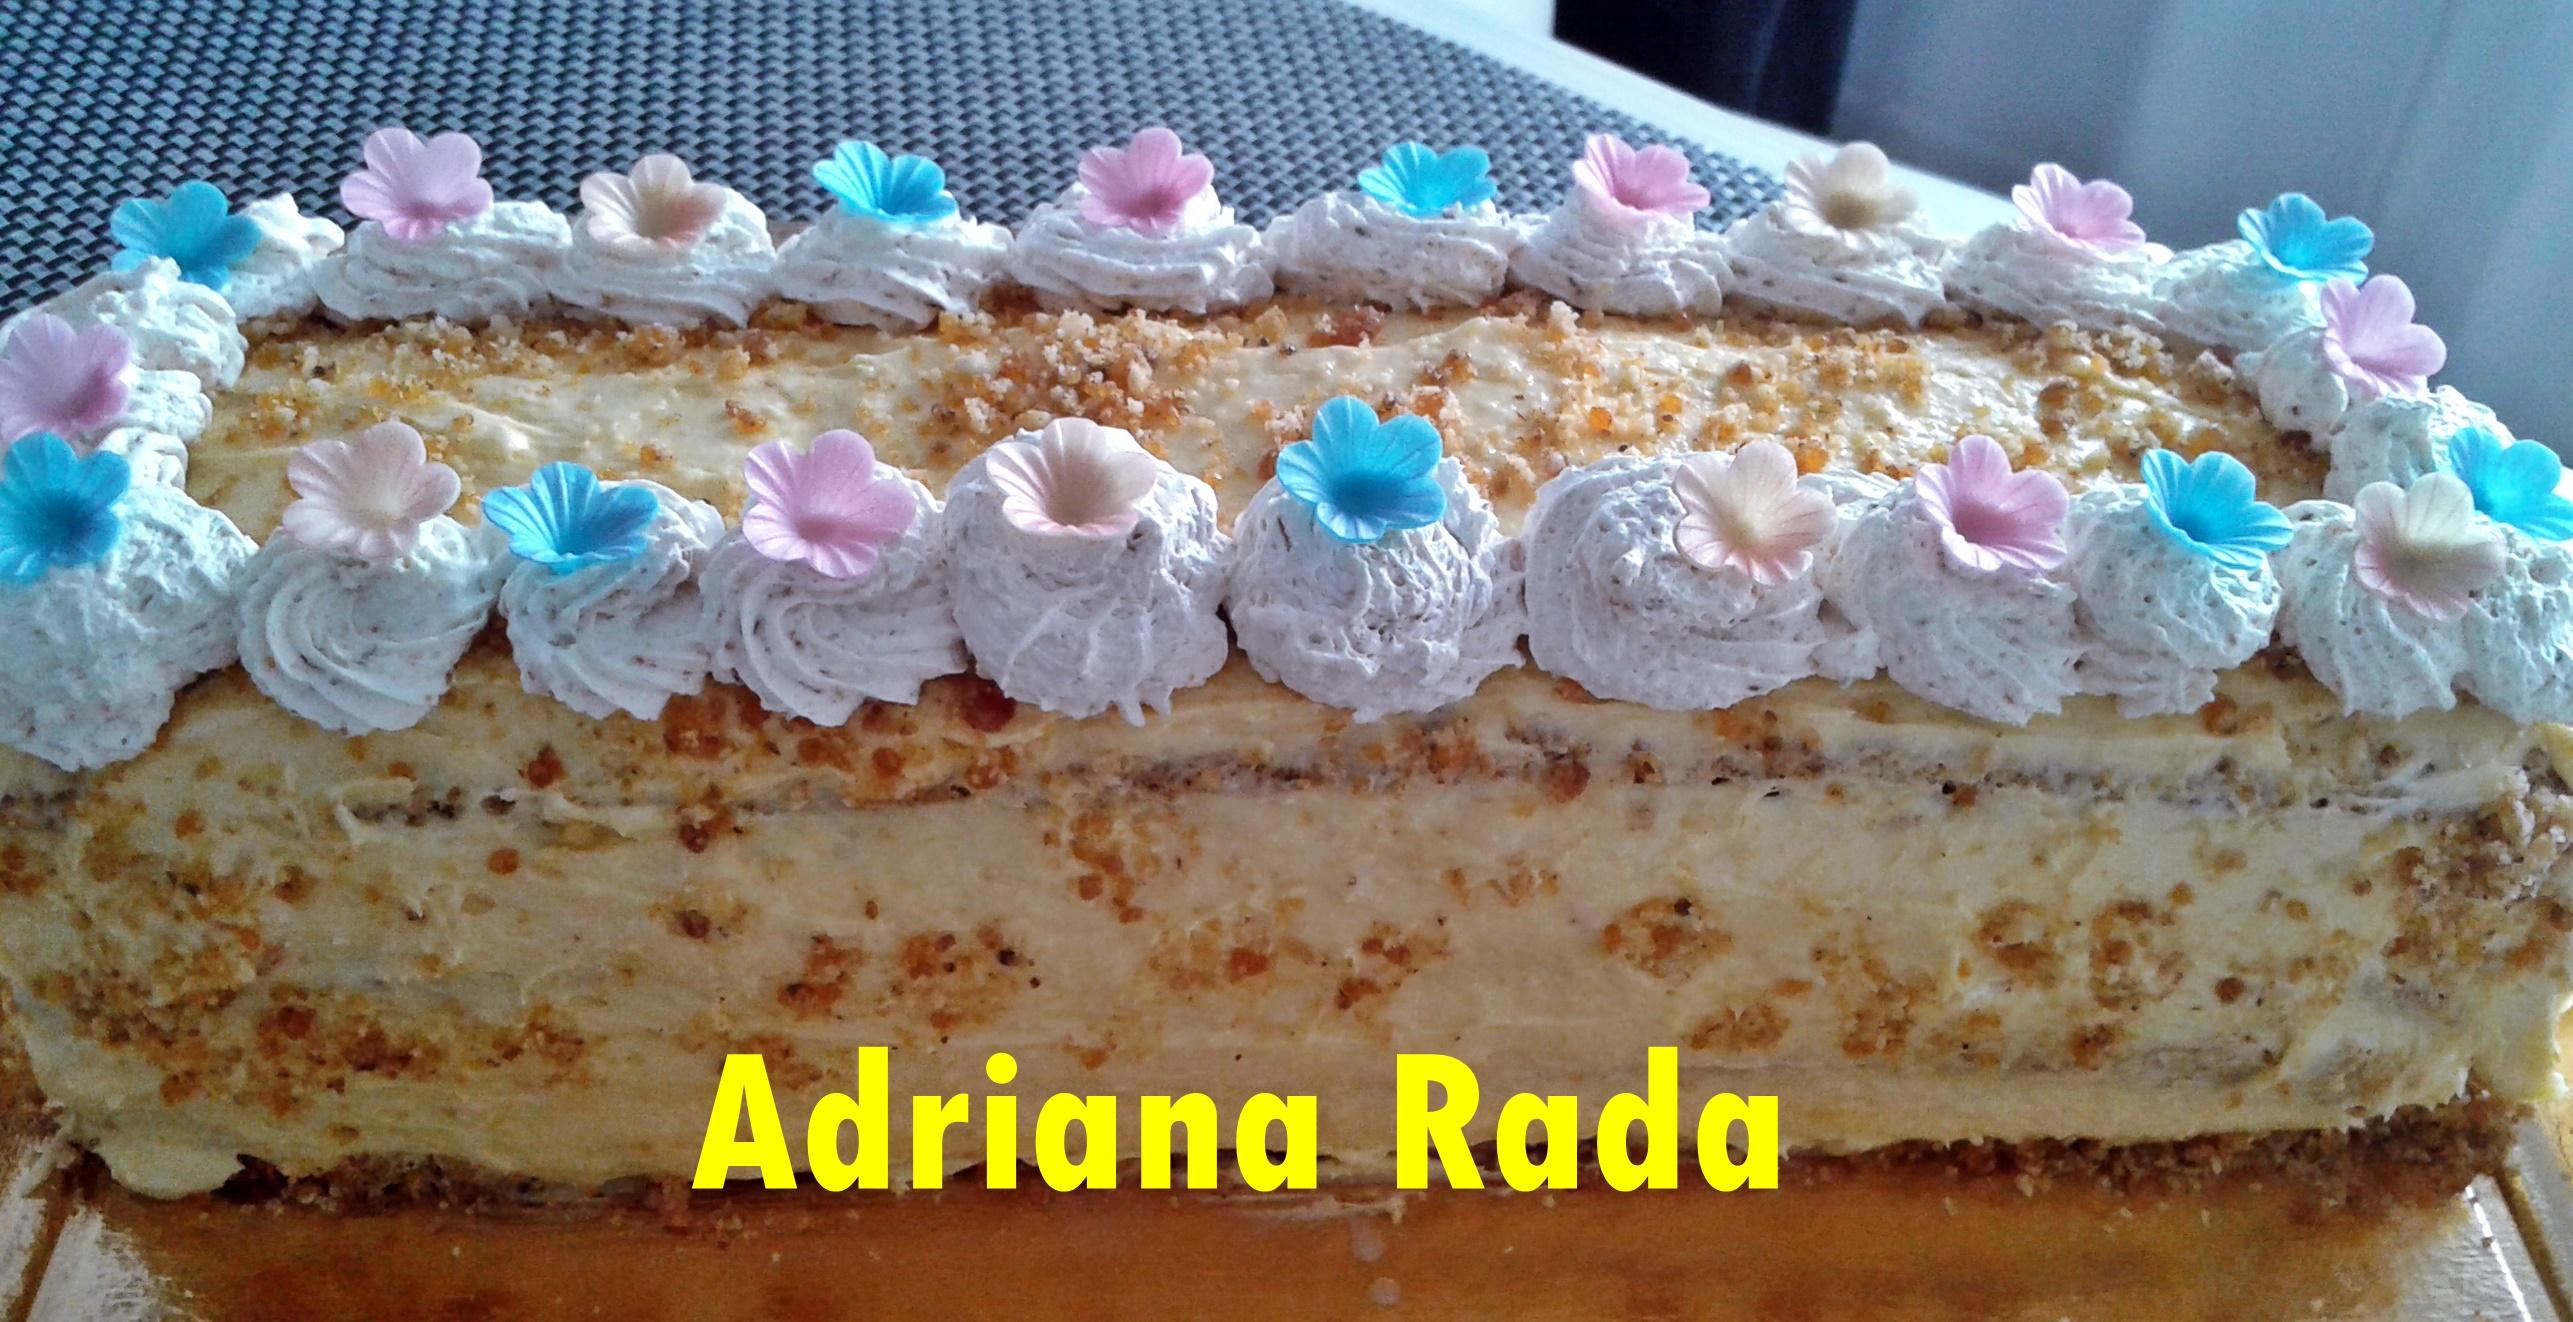 tort egiptean adriana rada reteta simpla - Index retete culinare (categorii)